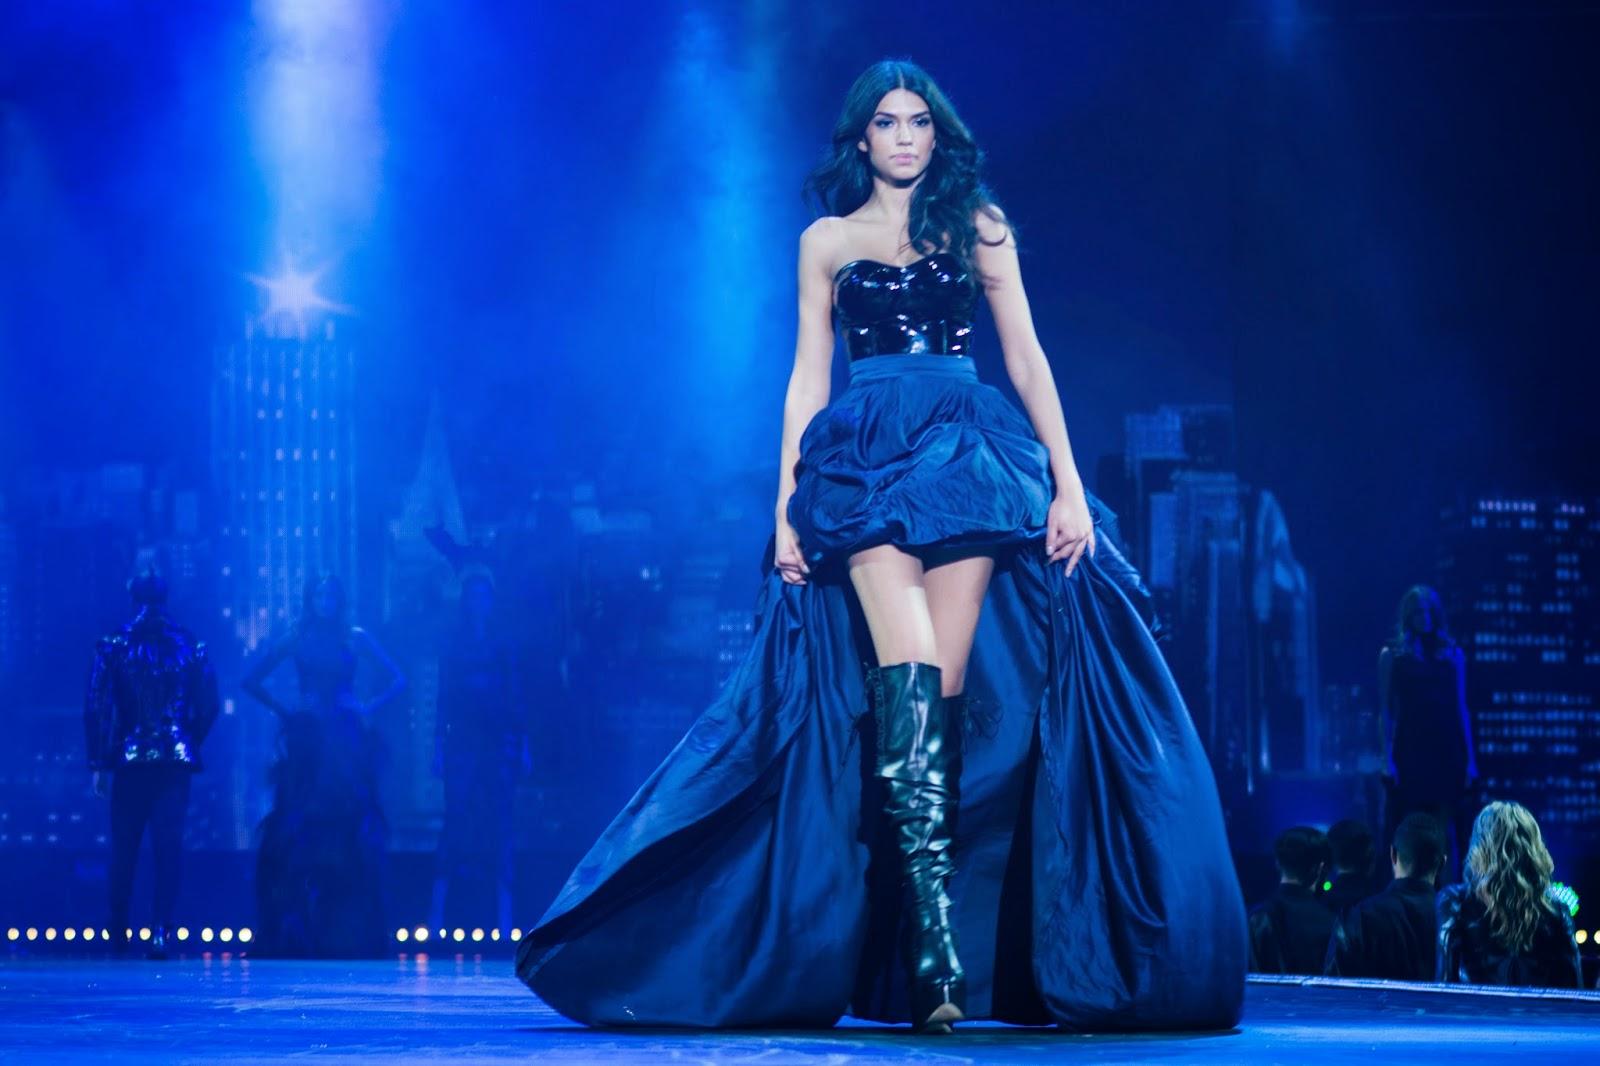 The Clothes Show Live 2014